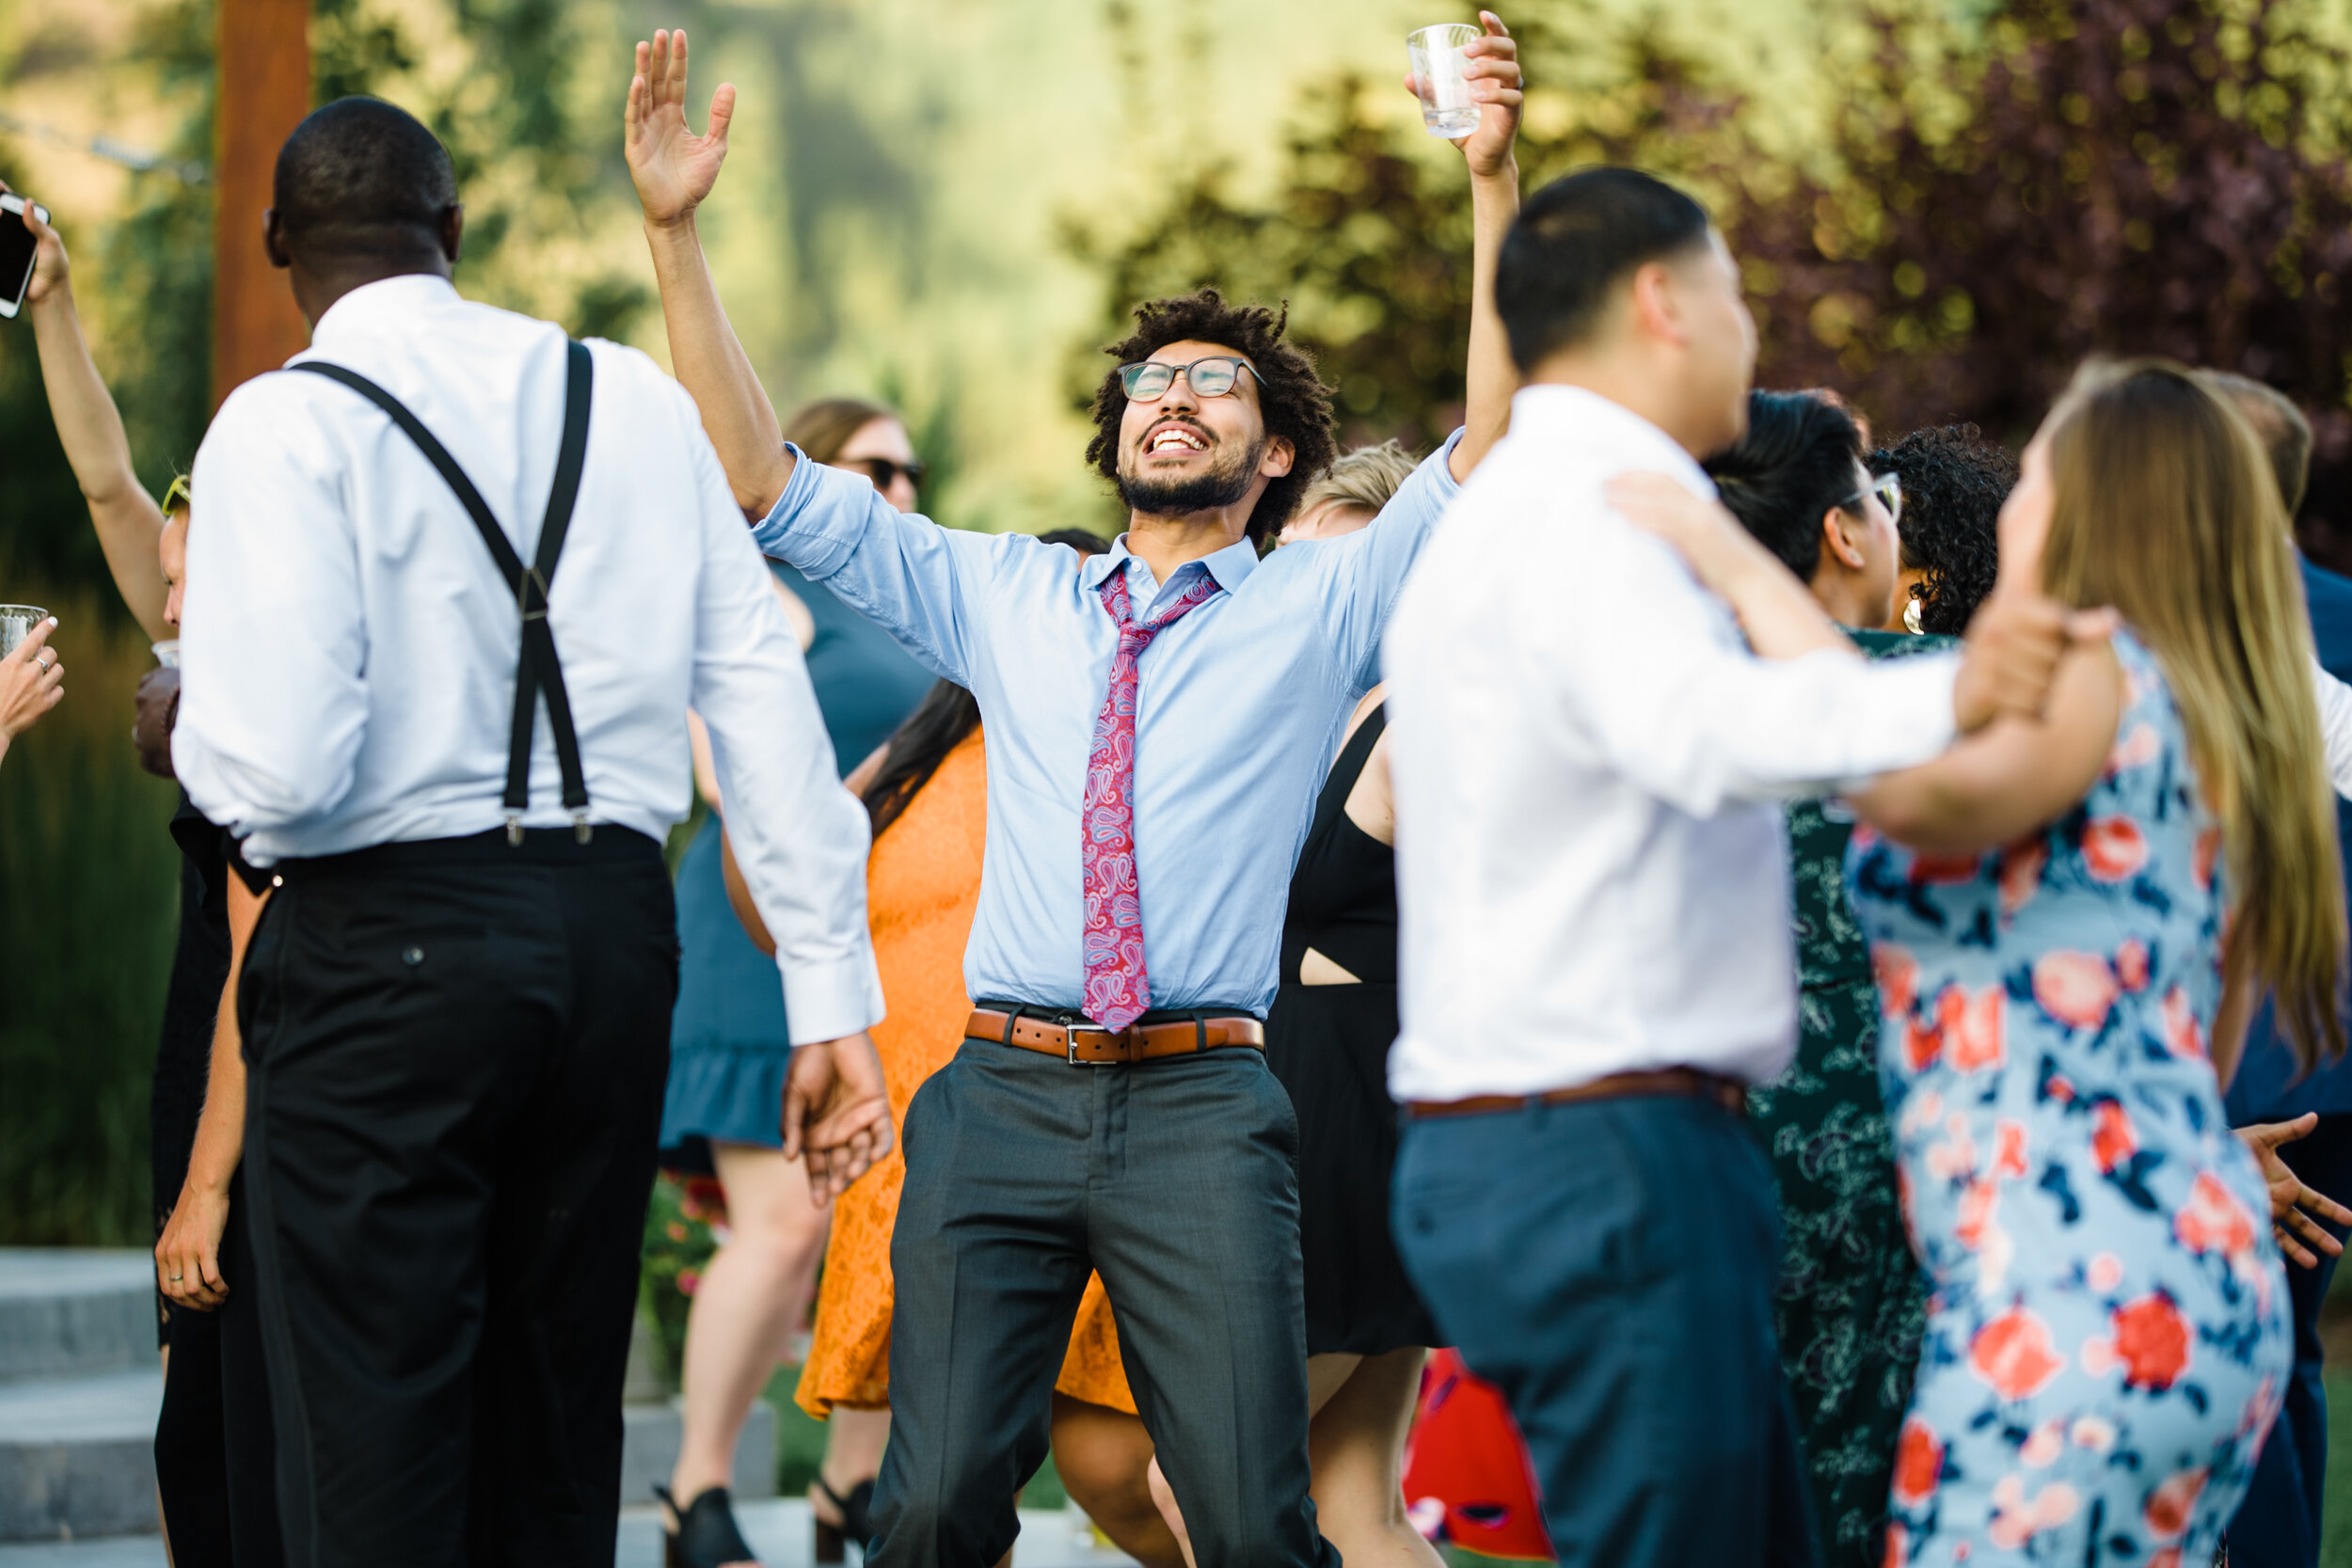 885White Raven Wedding_Montana Wedding Photographer_Rebekah & Likom_Honeybee Weddings_July 27, 2019-2260.jpg